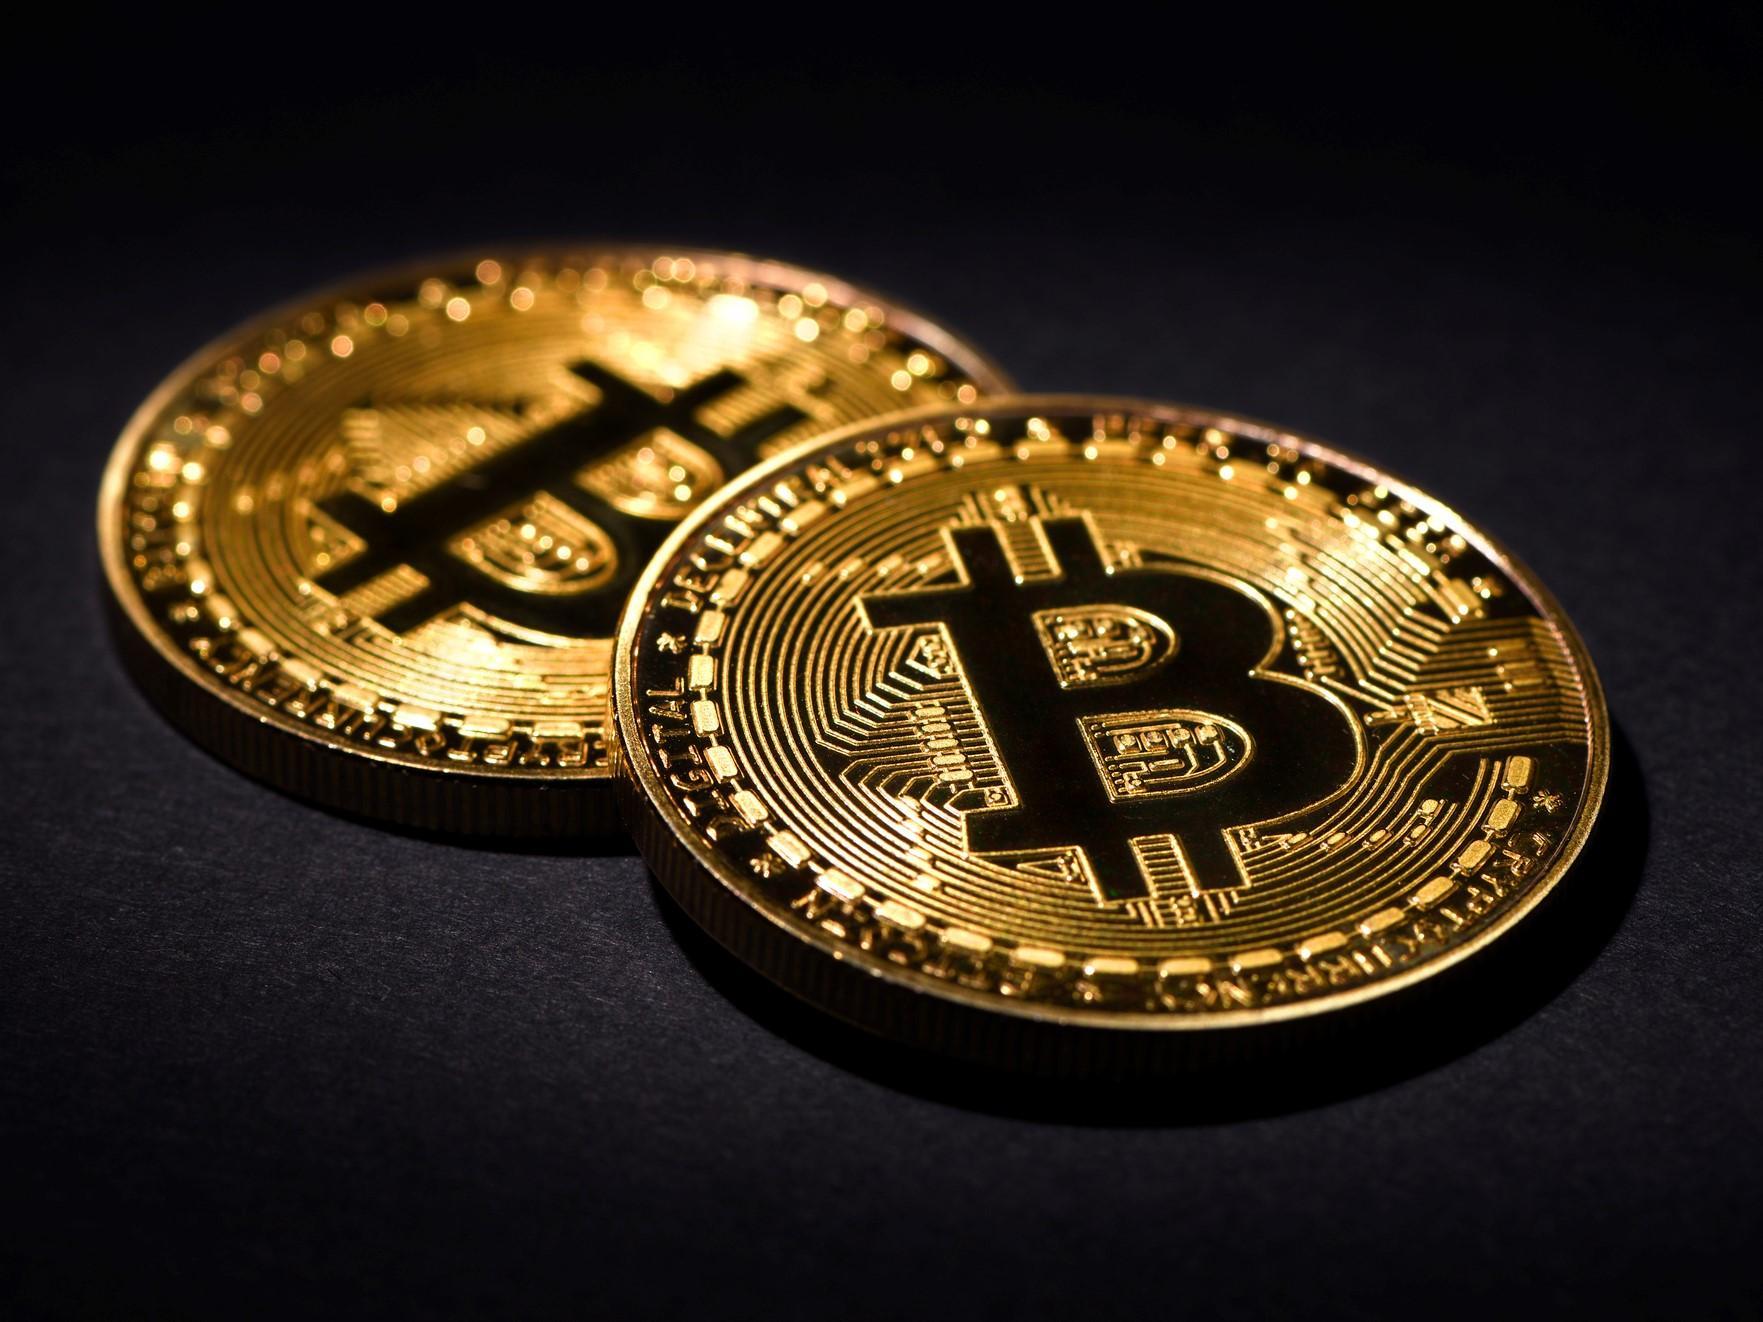 bitcoin fiyatinda siradaki hedef ne bogalar mi kazanacak ayilar mi